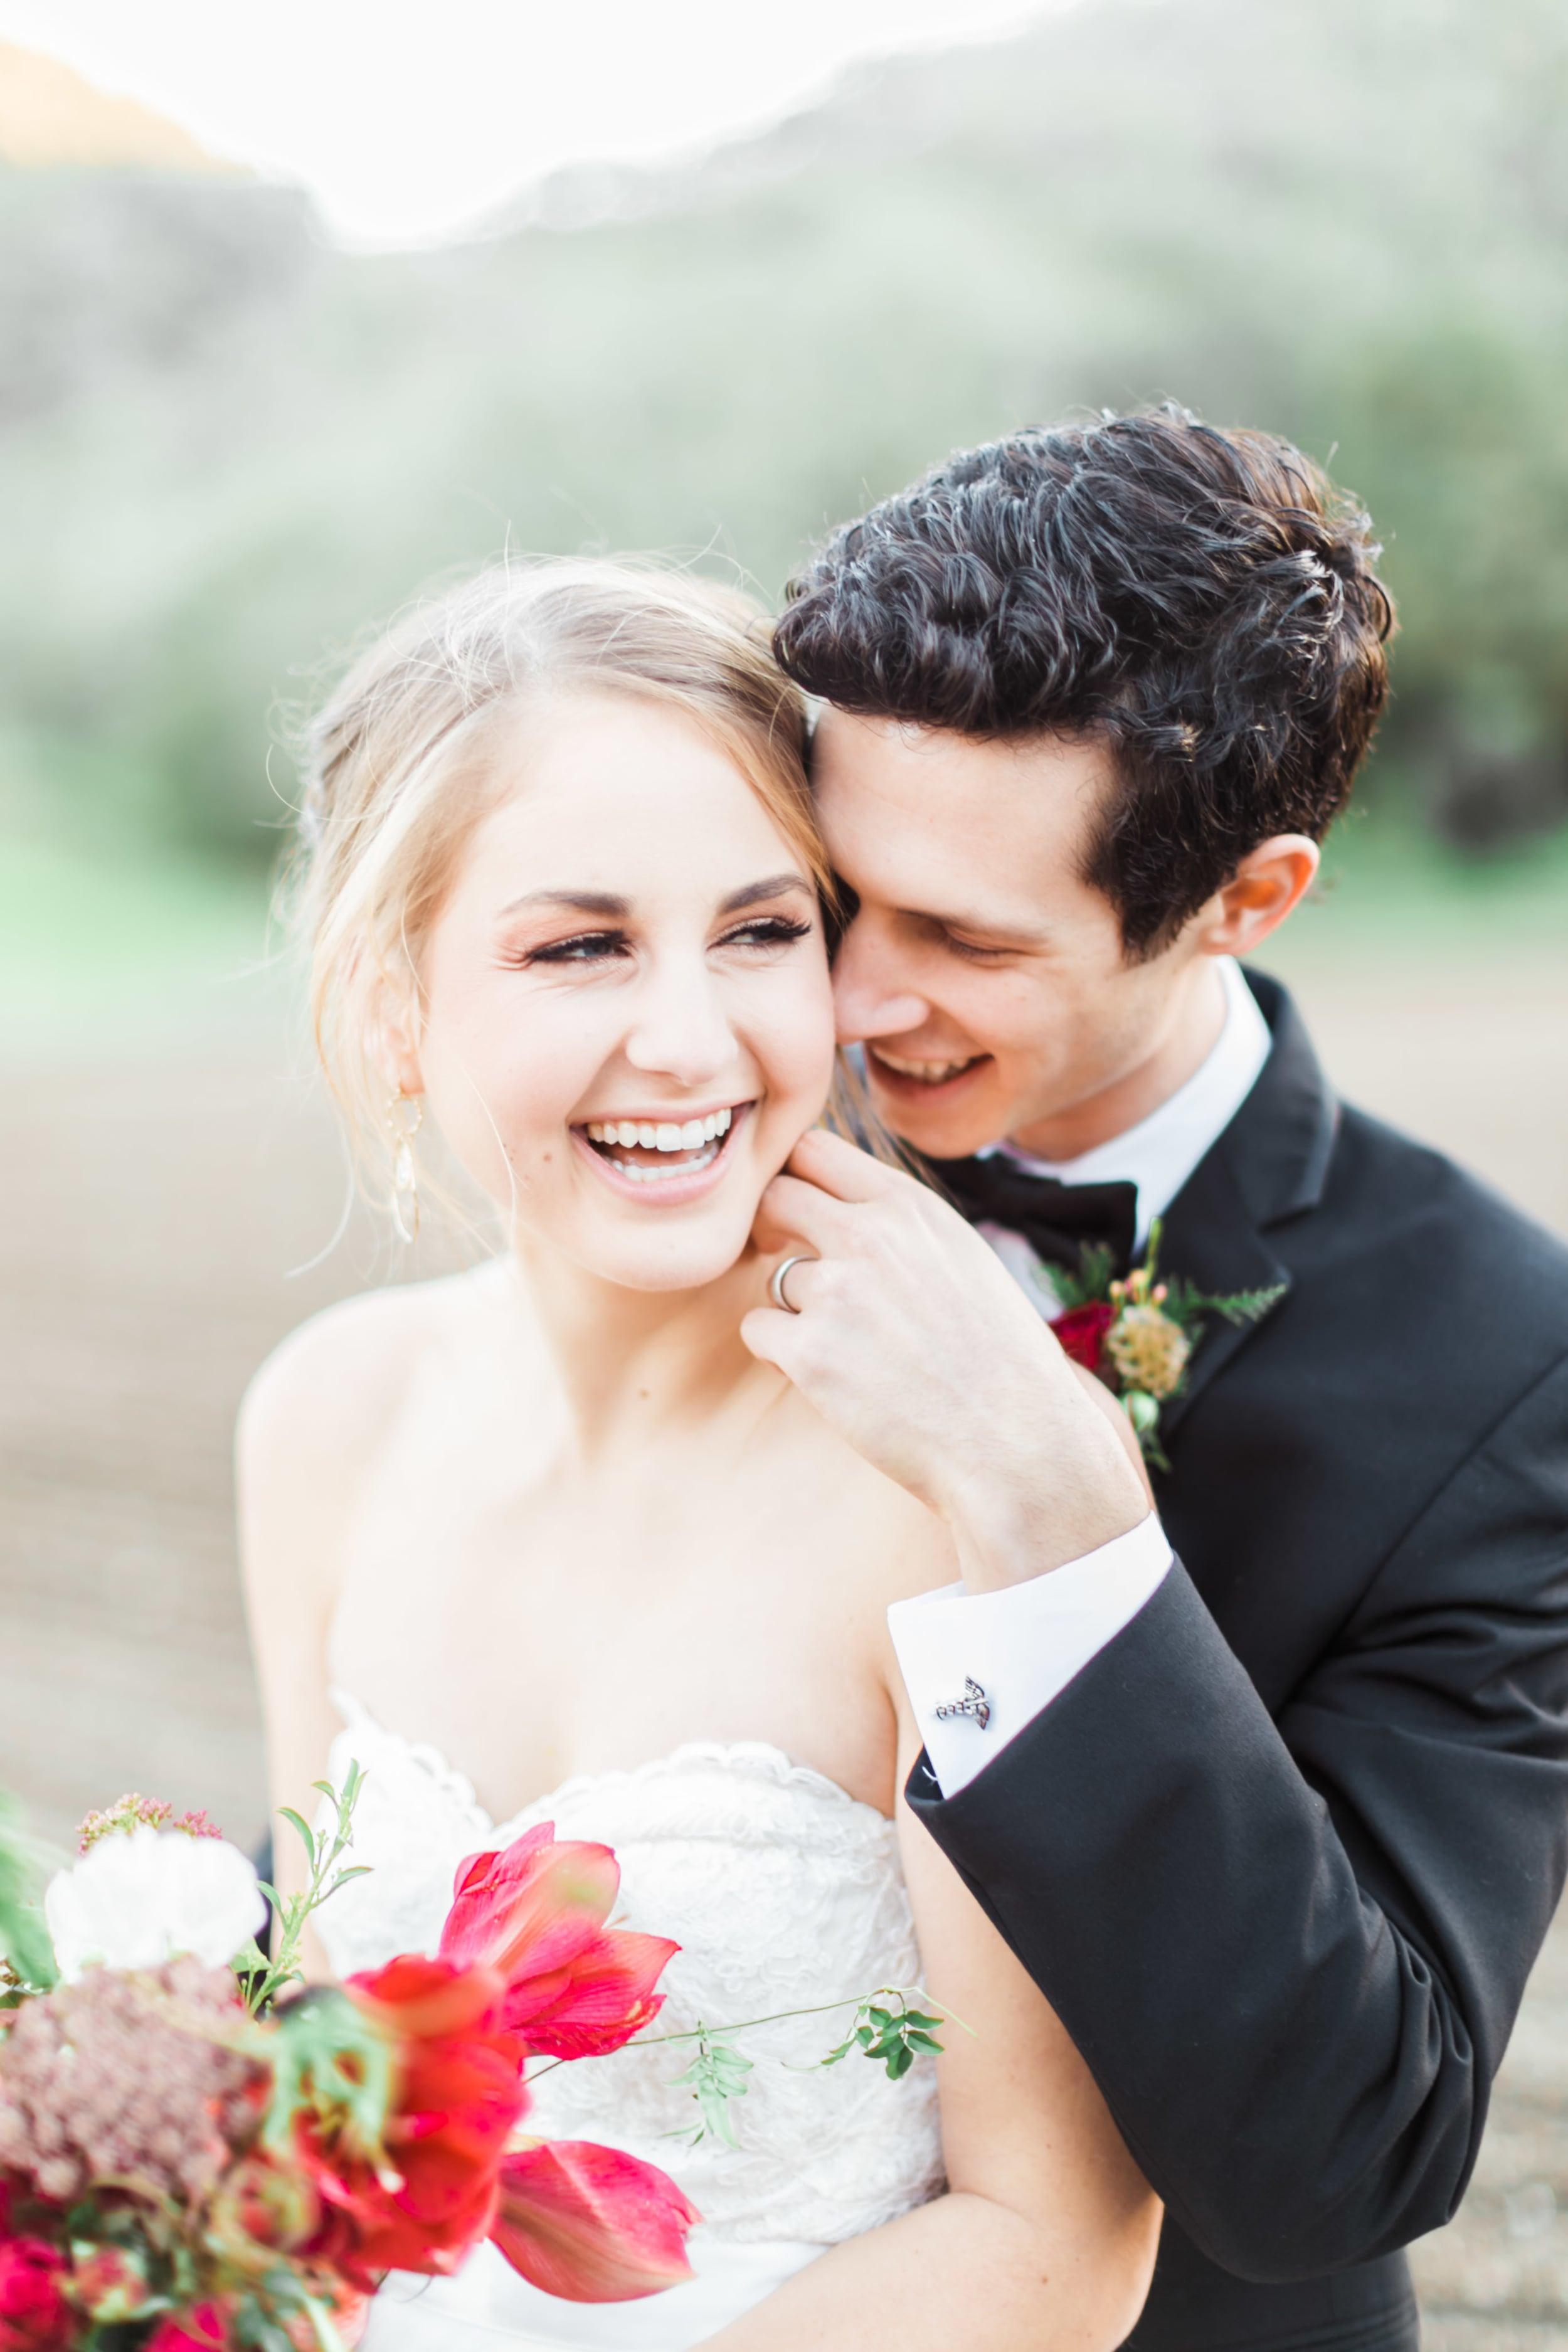 Natalie_Schutt_Photography_Winter_Wedding_San_Luis_Obispo-182.jpg